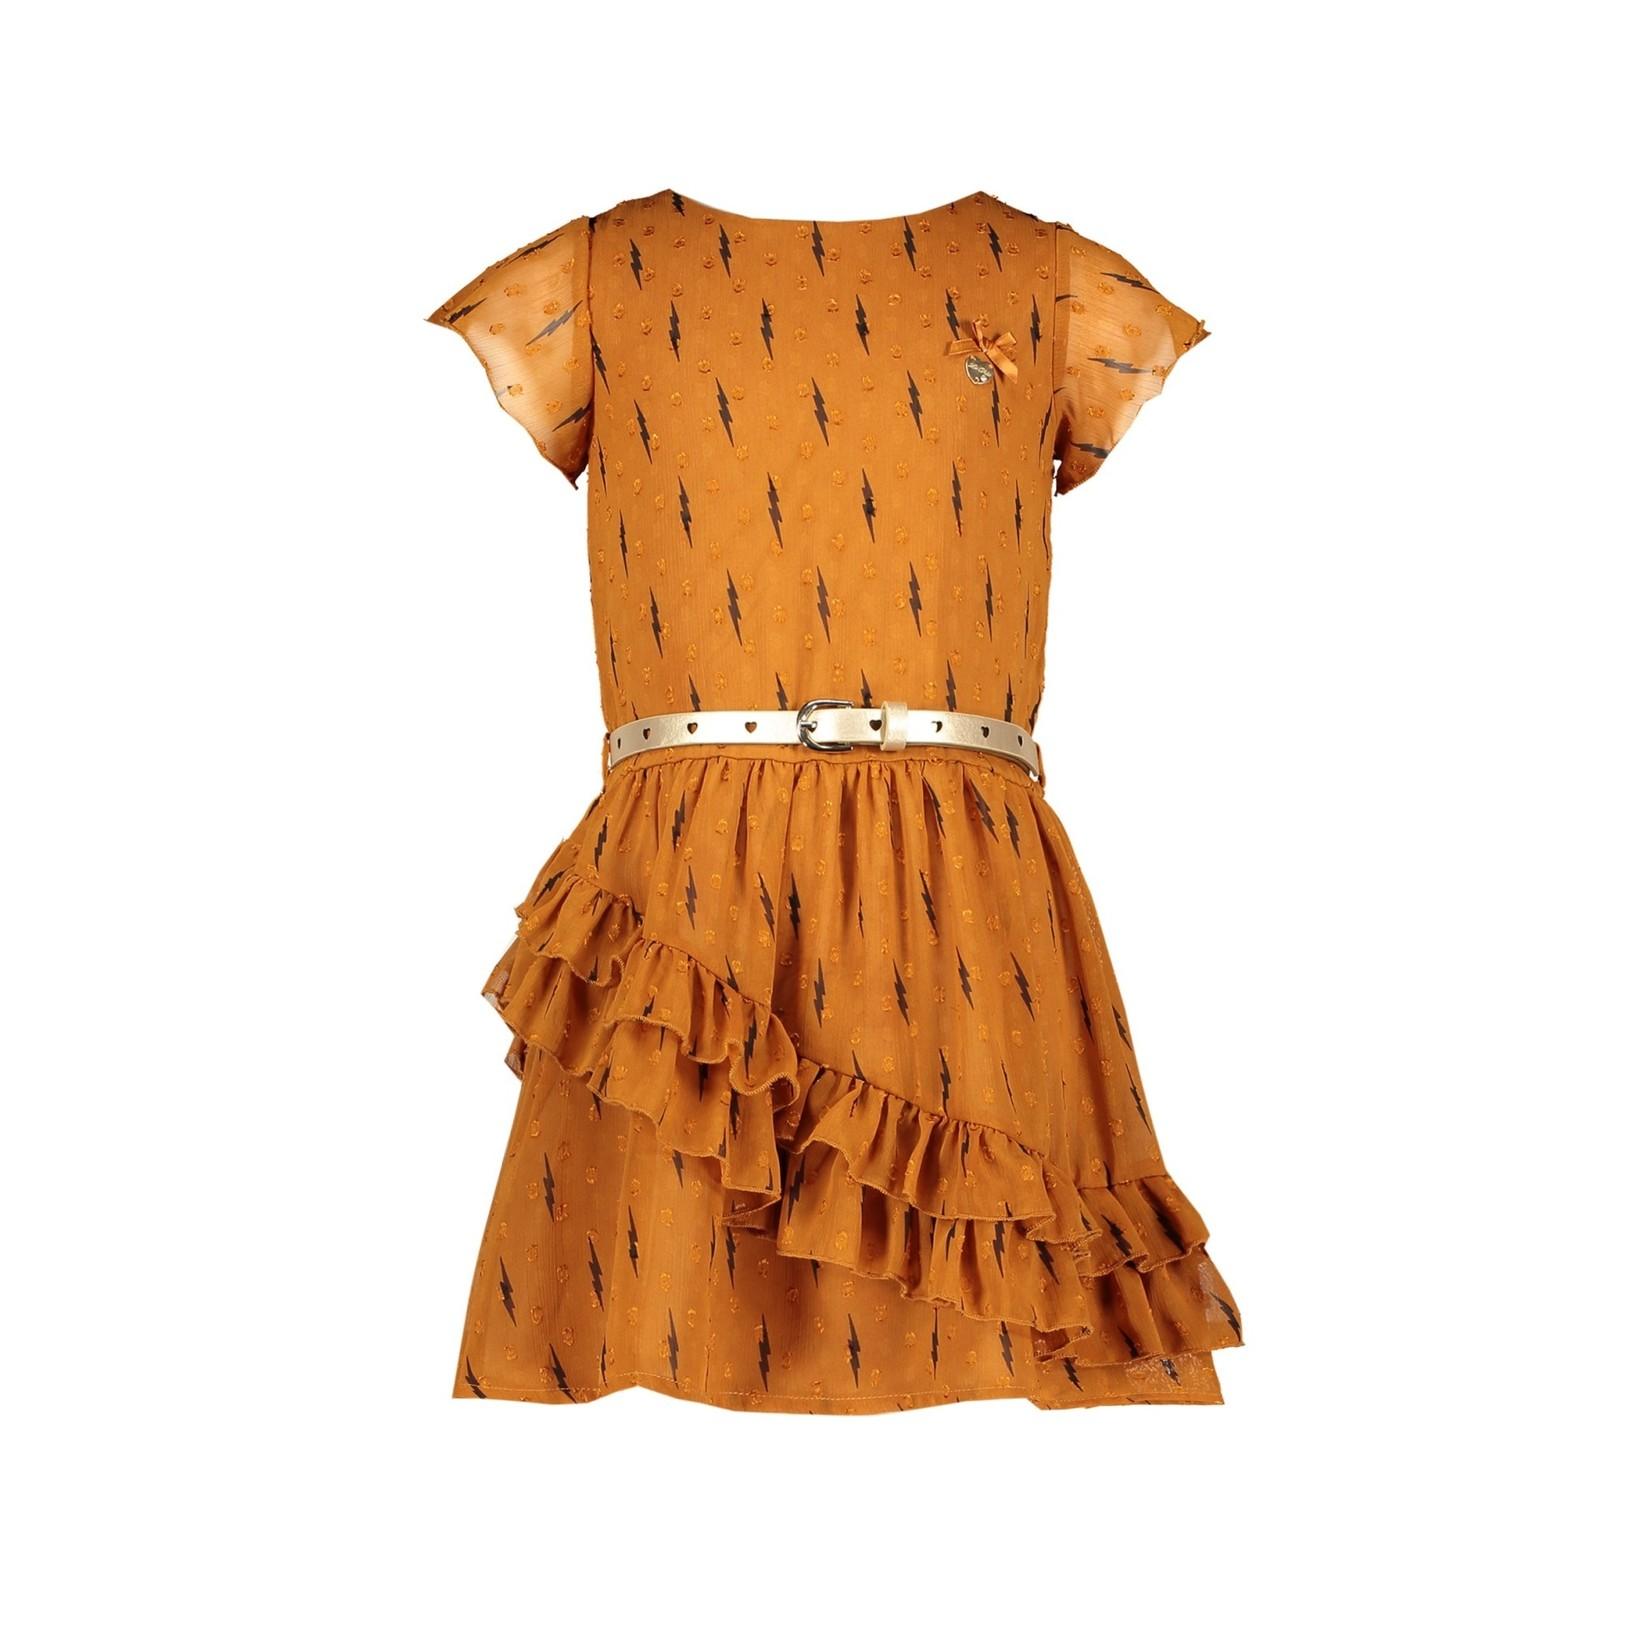 Le Chic Le Chic dress ruffles lightning & dots